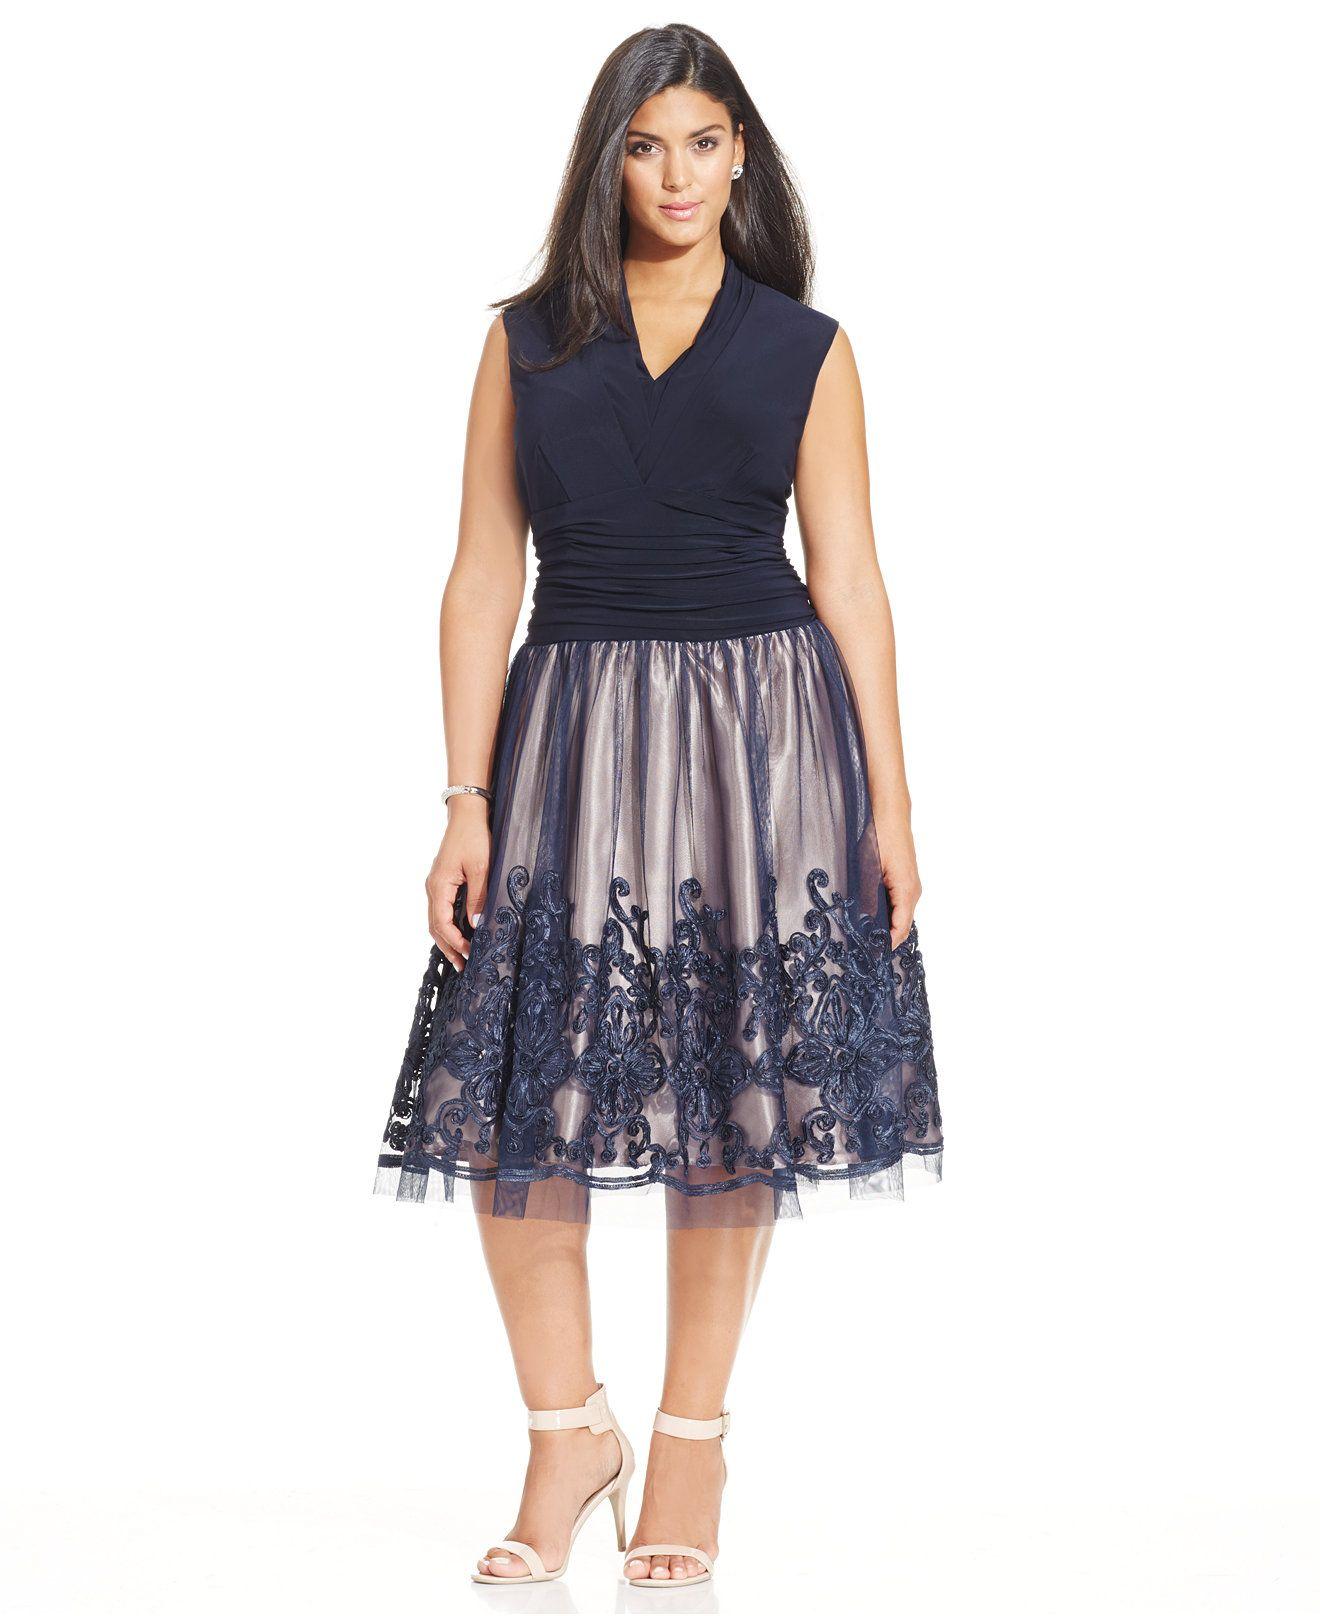 sl fashions plus size embroidered pleat dress - plus size dresses